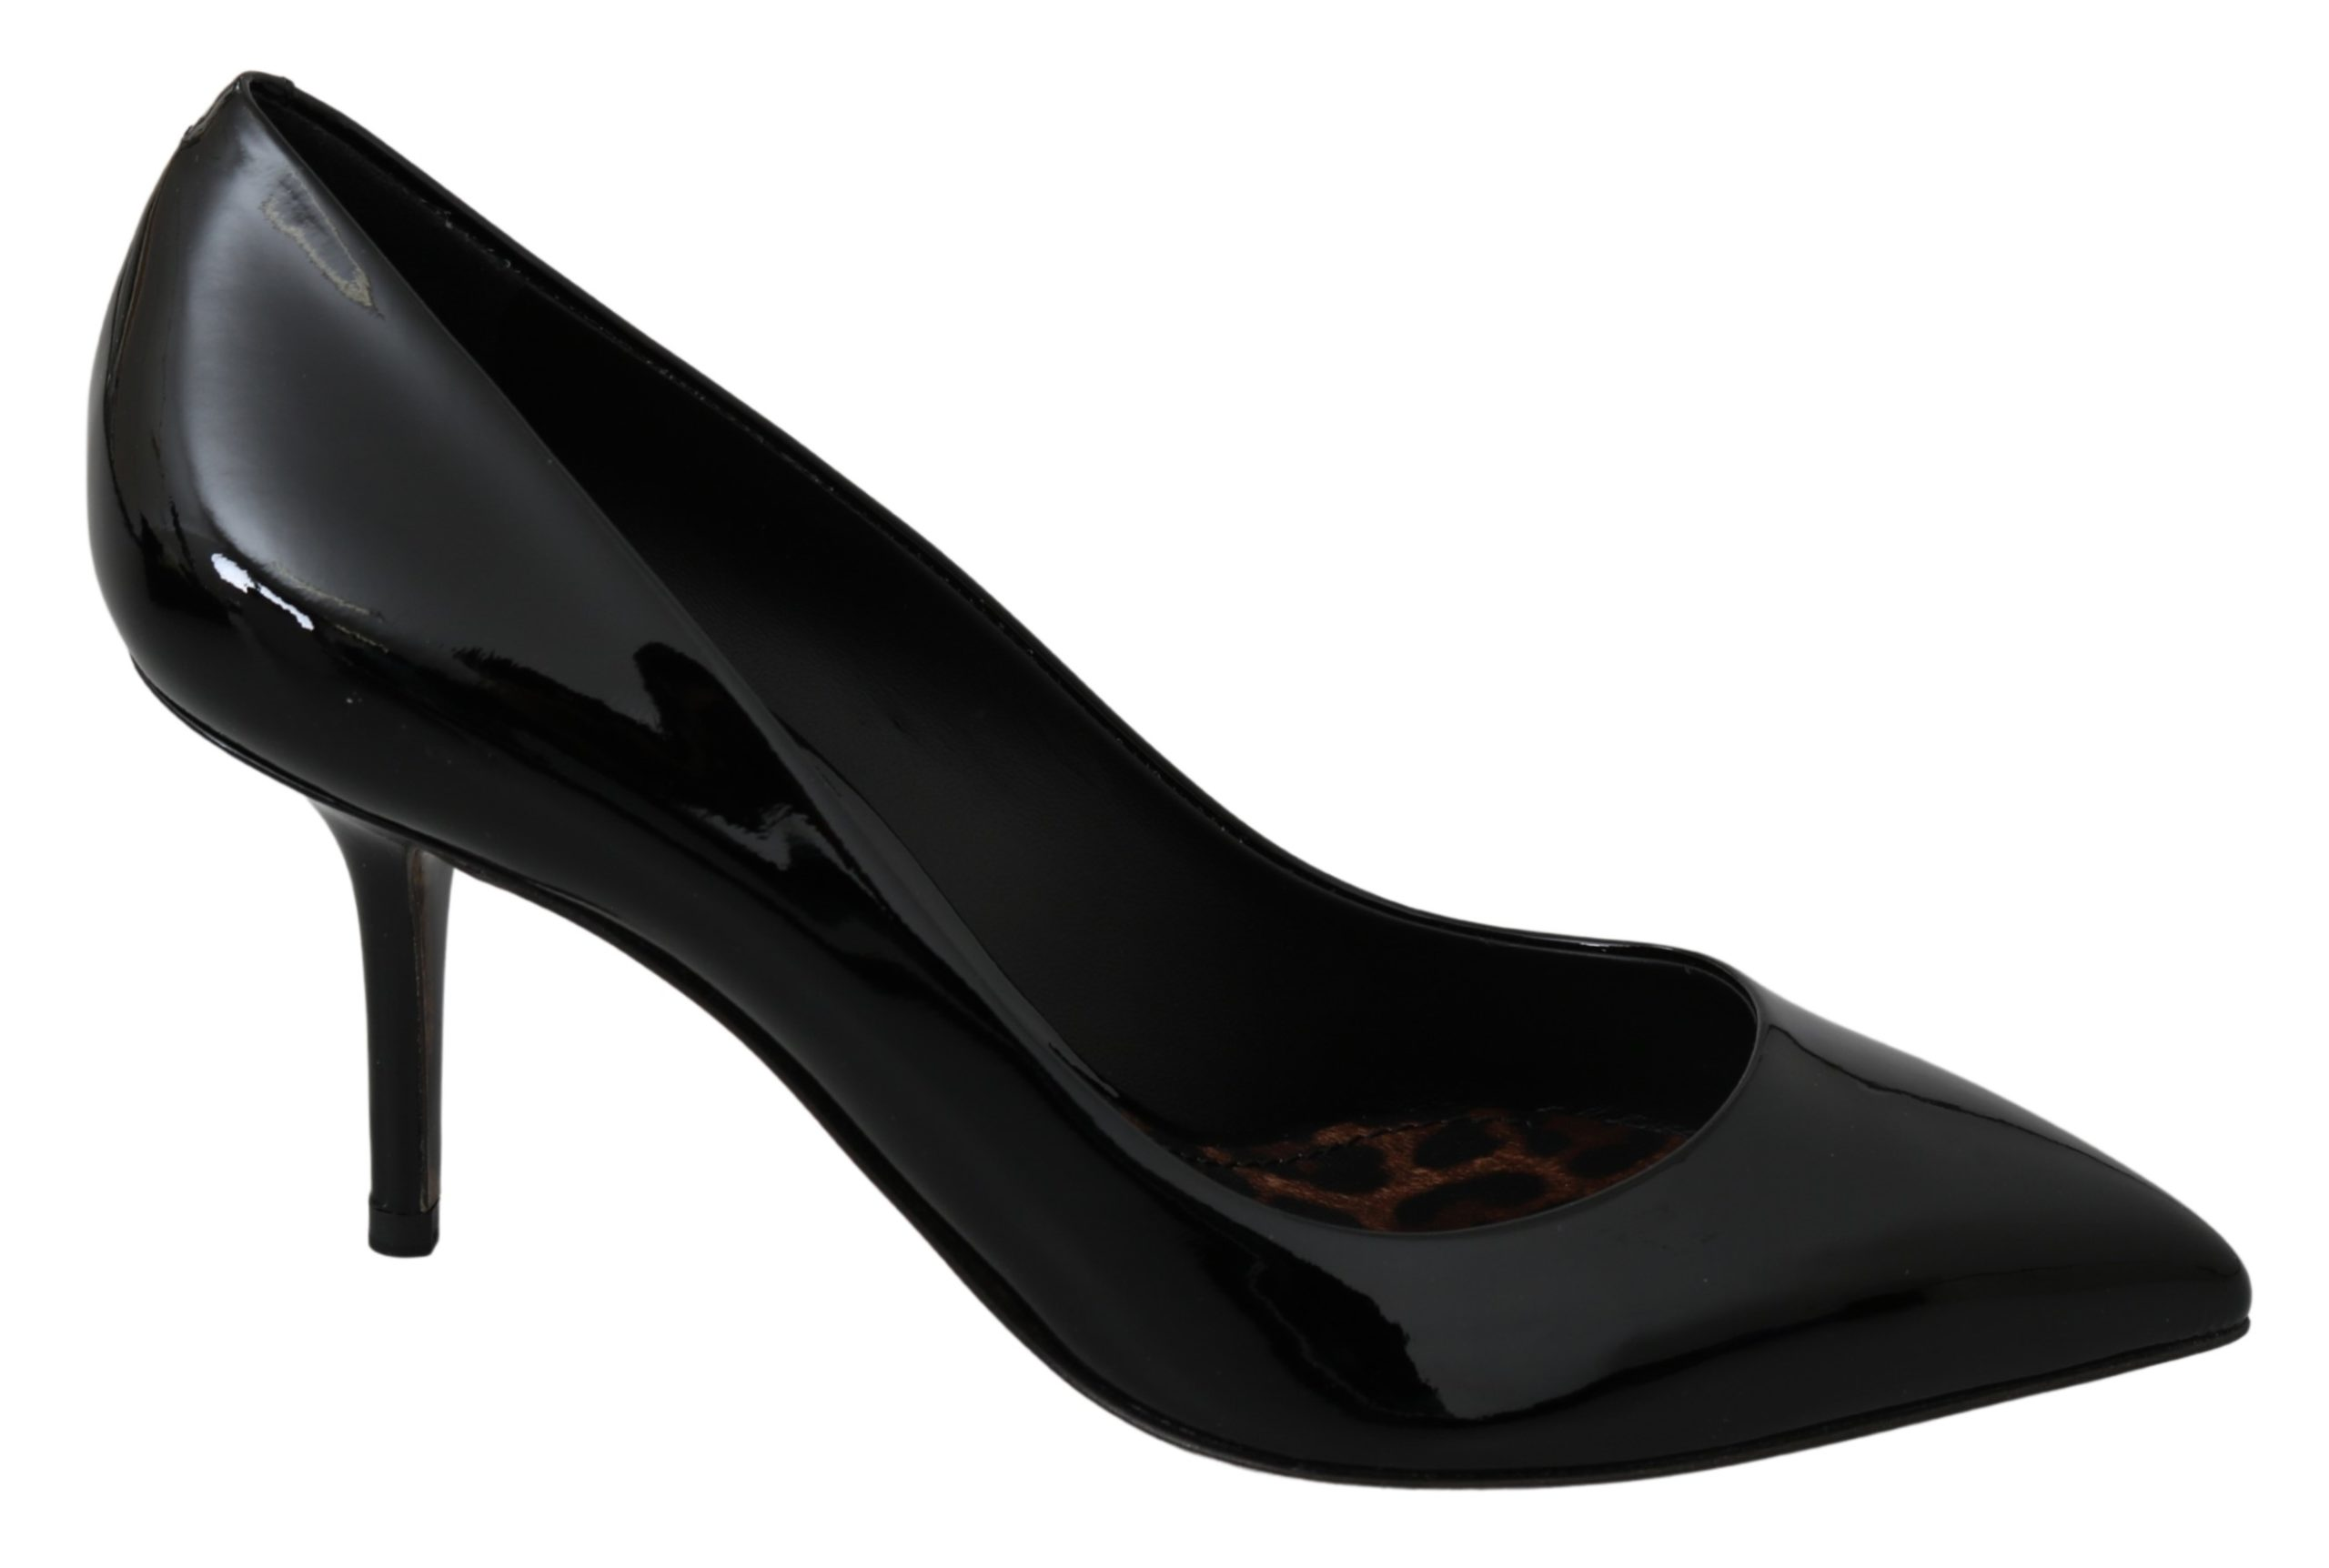 Dolce & Gabbana Women's Patent Leather High Pumps Black LA6872 - EU38/US7.5